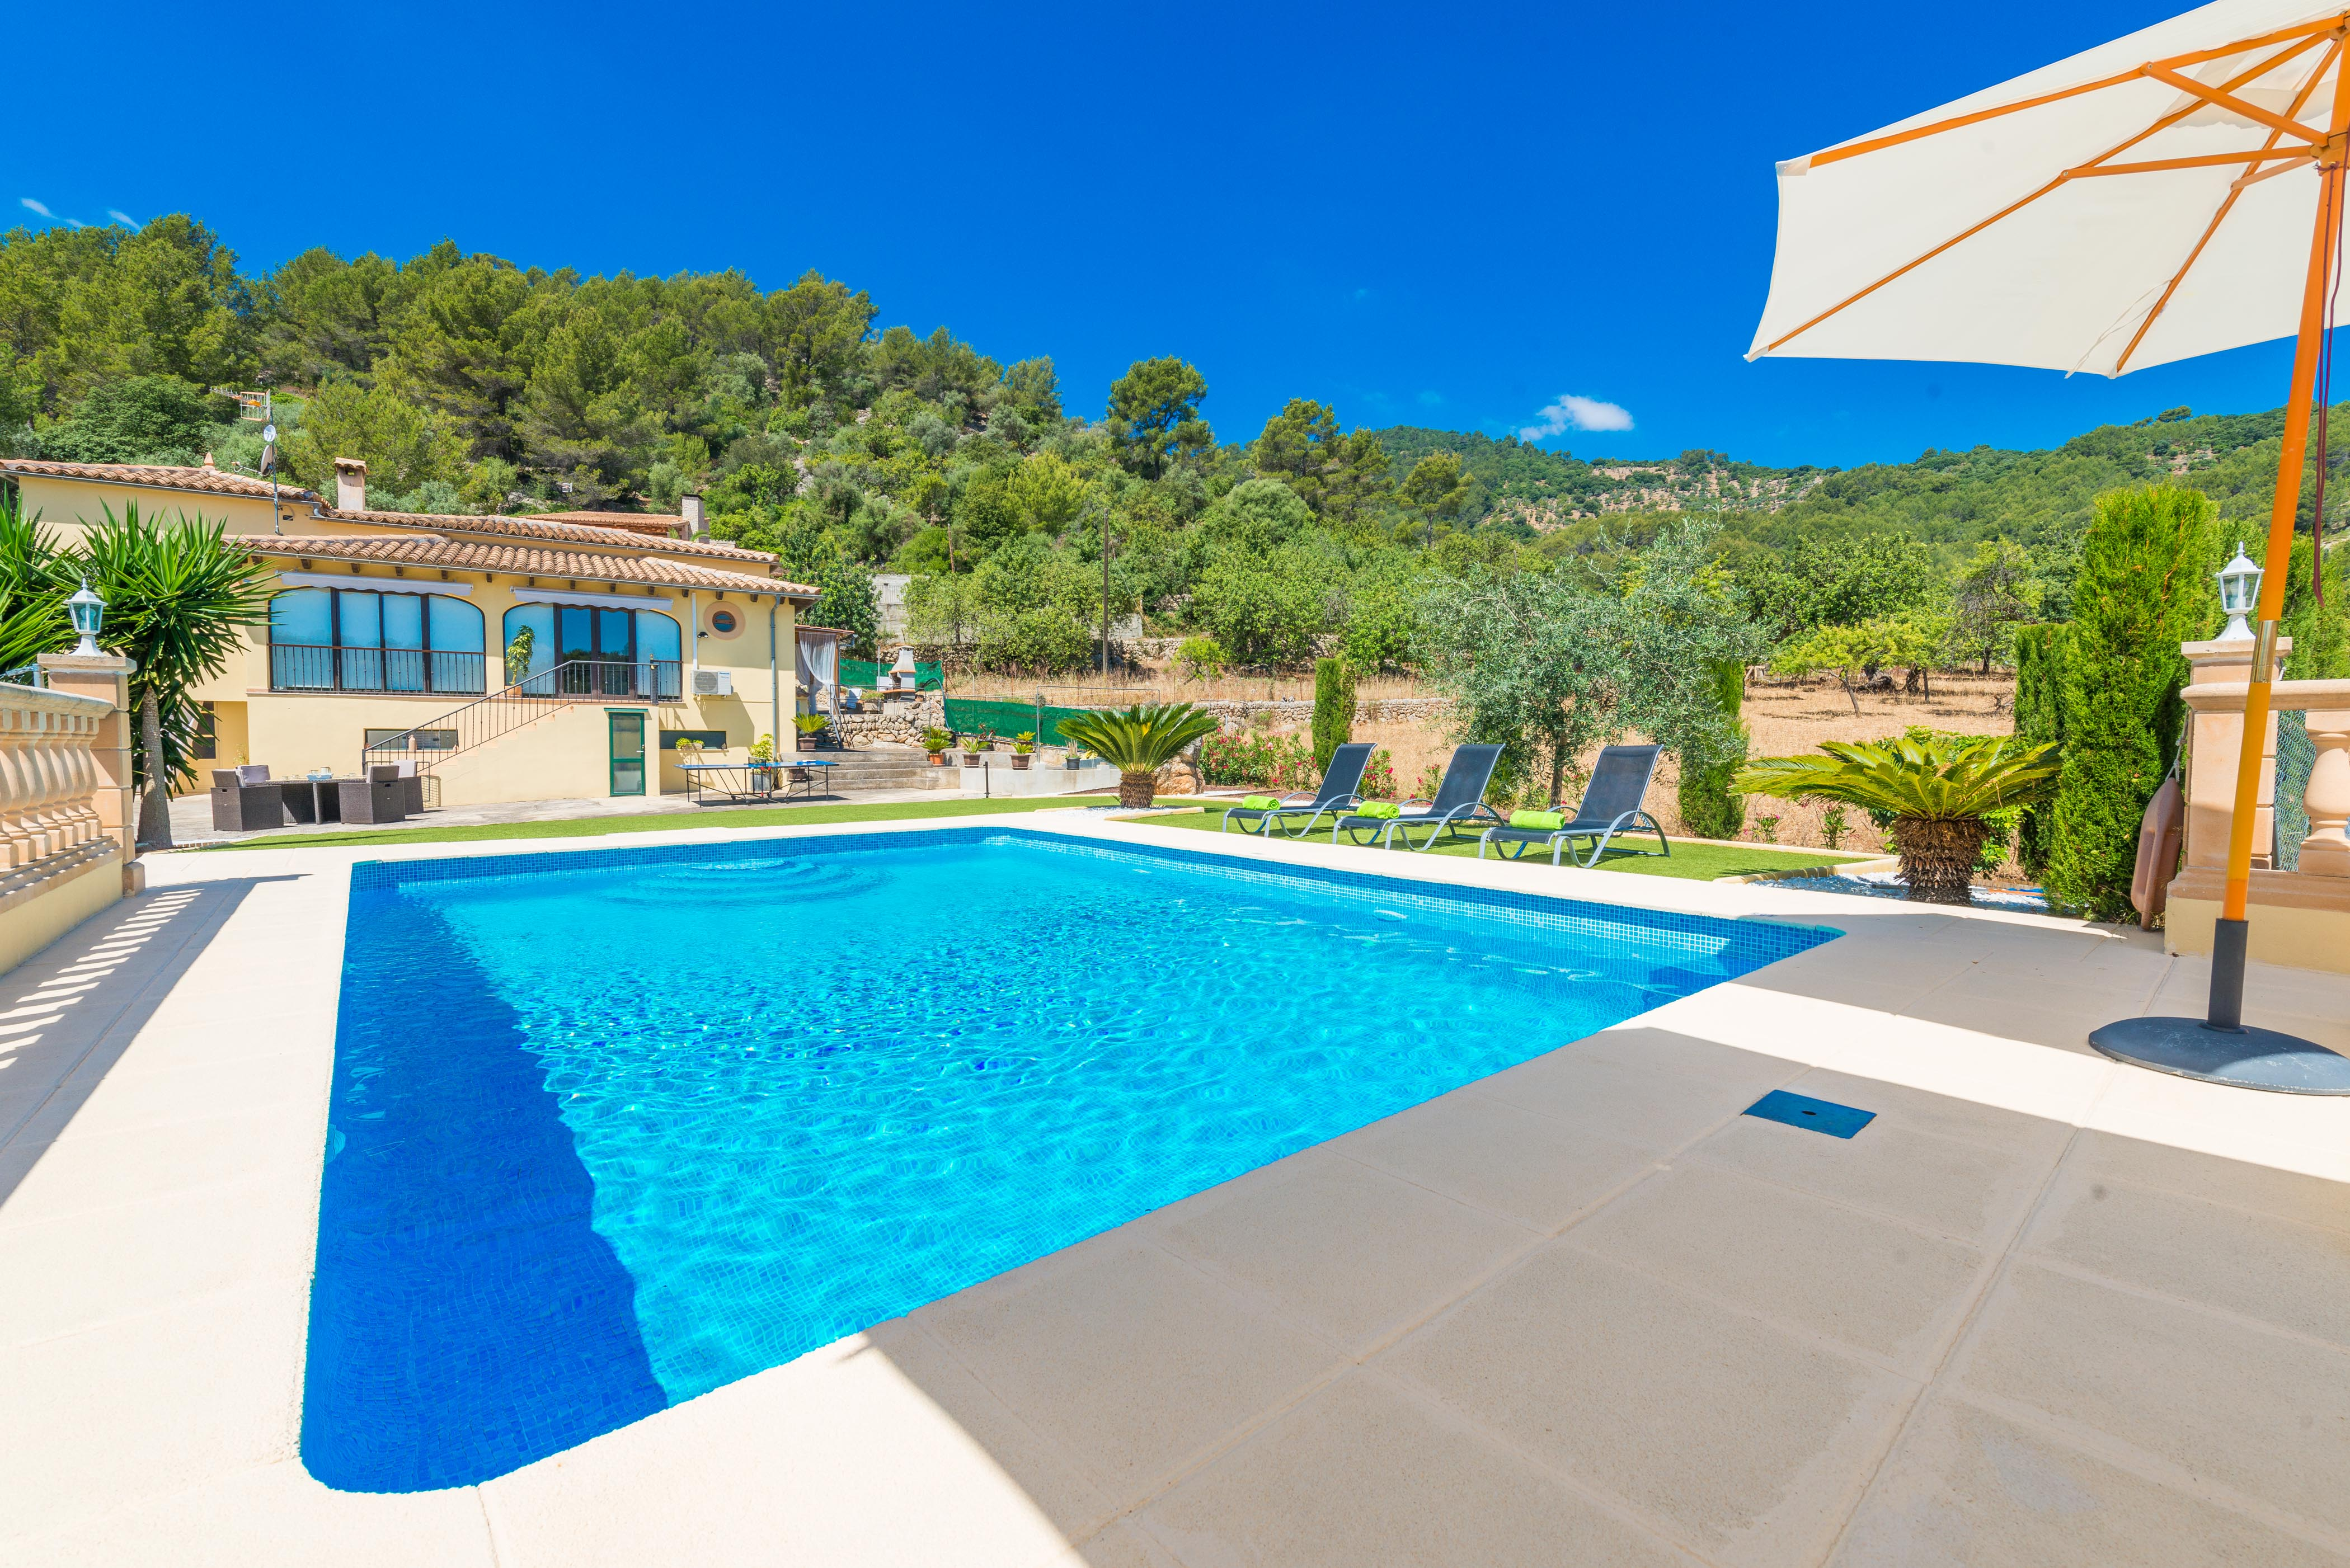 Ferienhaus SA TANCA (MANCORINA) (2037553), Mancor de la Vall, Mallorca, Balearische Inseln, Spanien, Bild 27